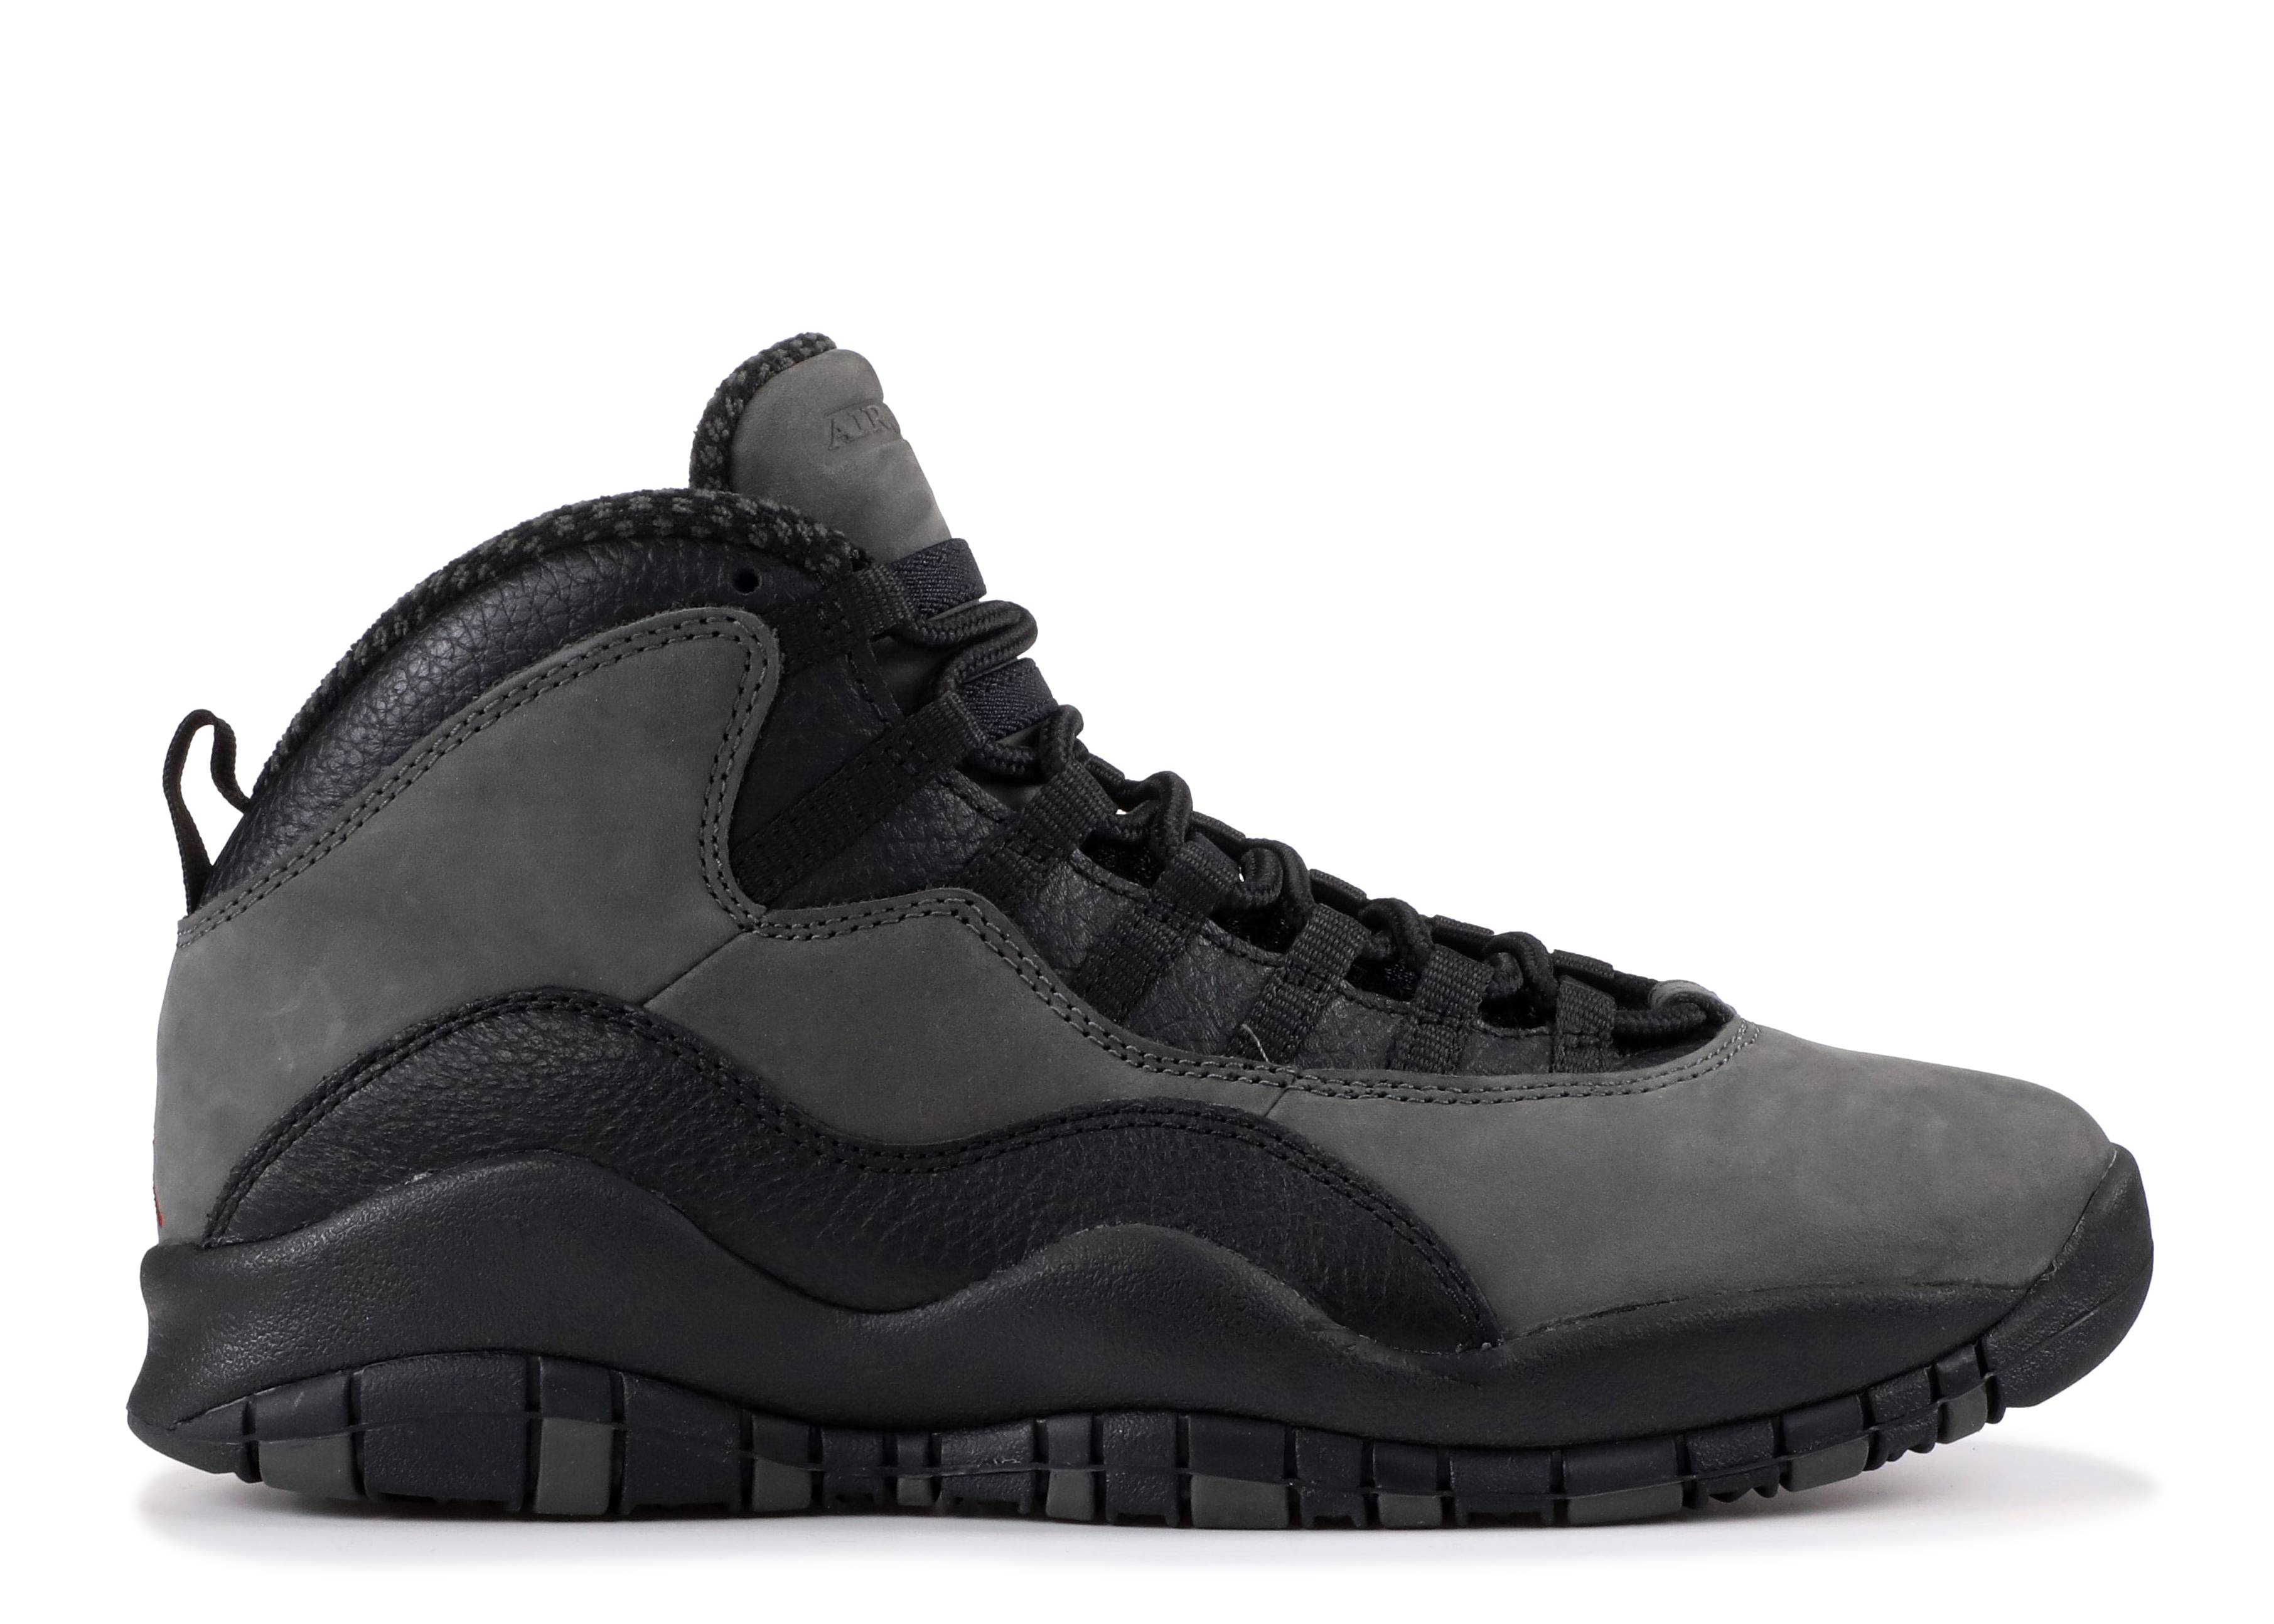 054dcfb8f65 Air Jordan 10 Retro